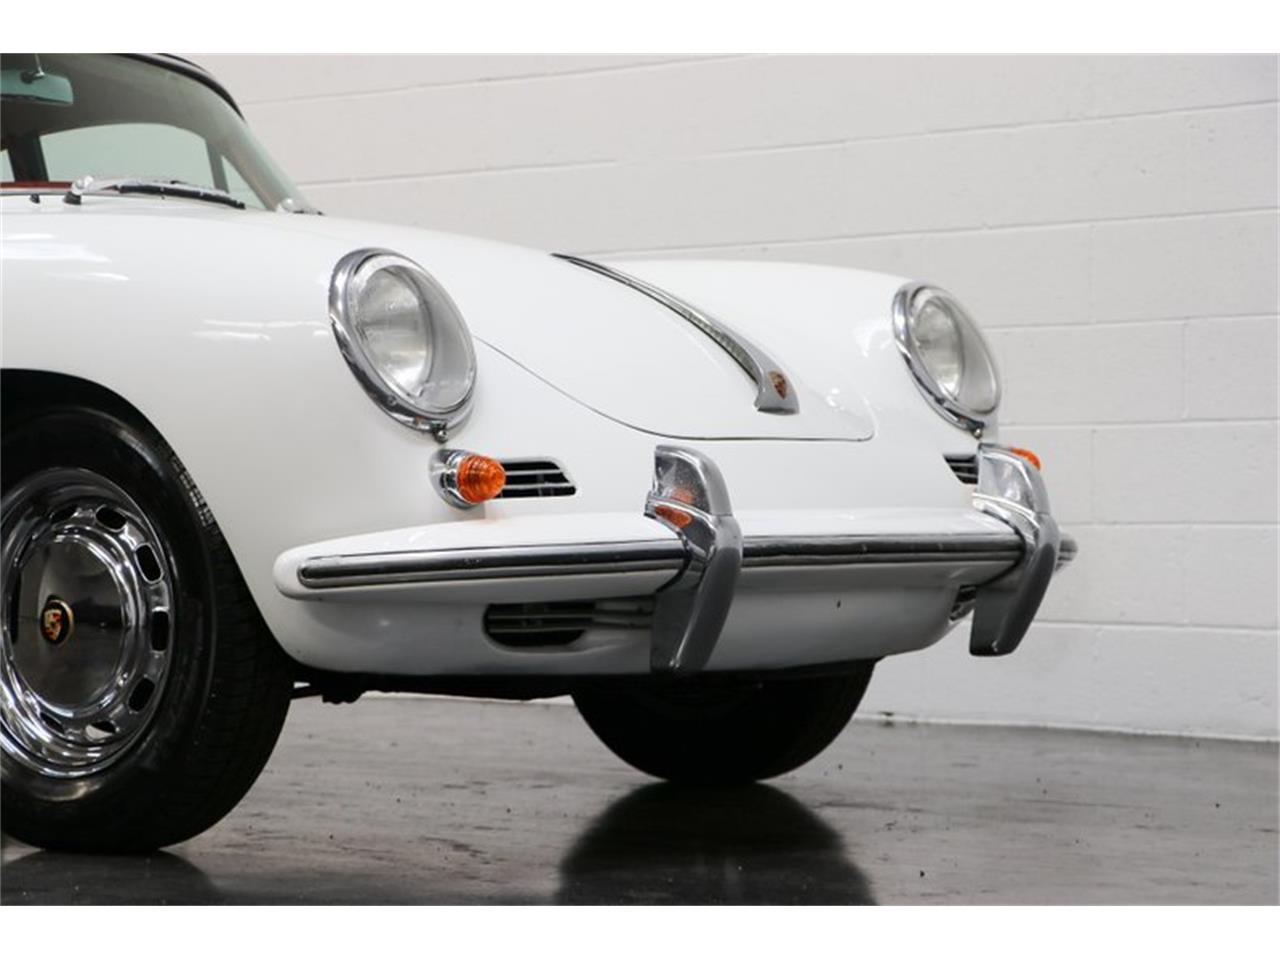 Large Picture of Classic '64 Porsche 356SC located in Costa Mesa California - $79,950.00 - P9GX